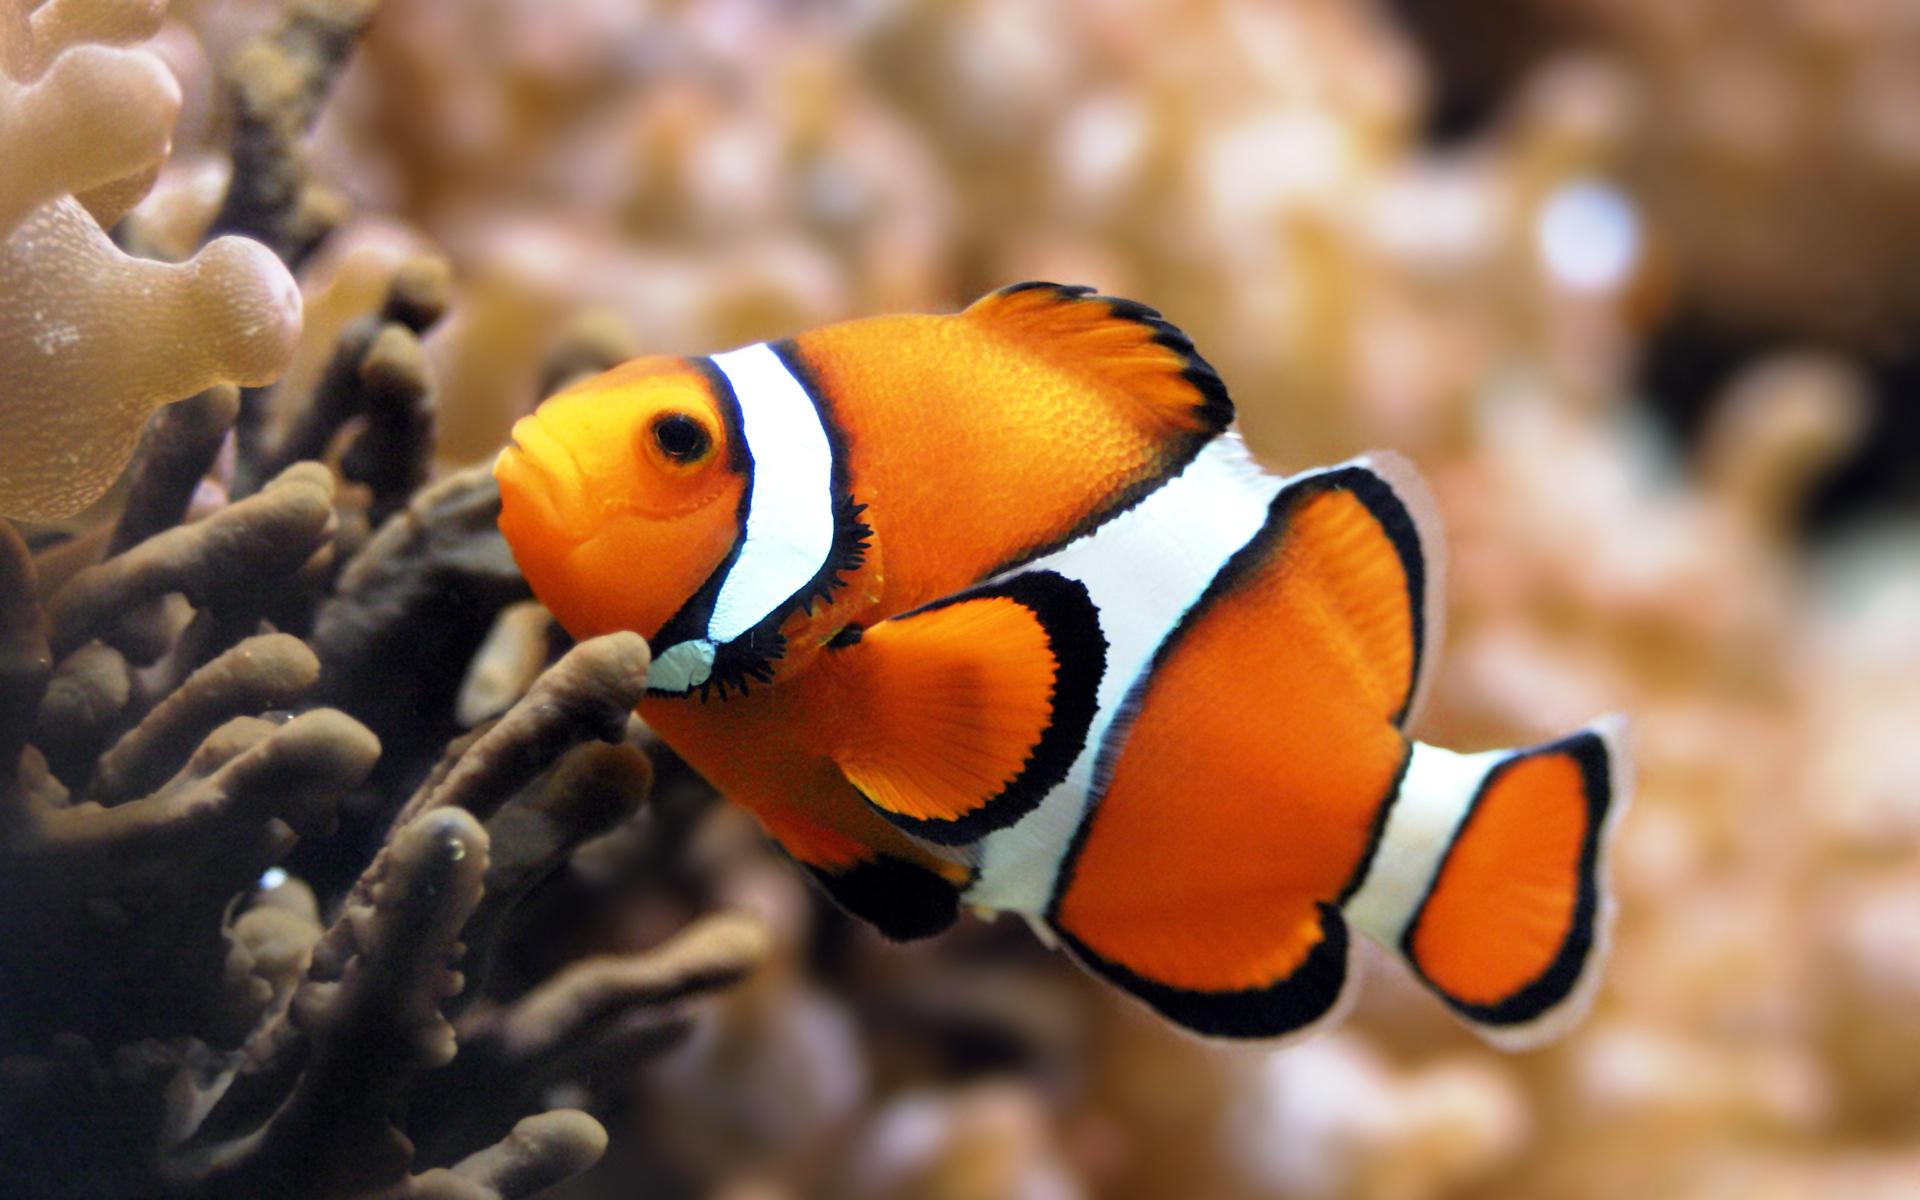 moving fish wallpaper